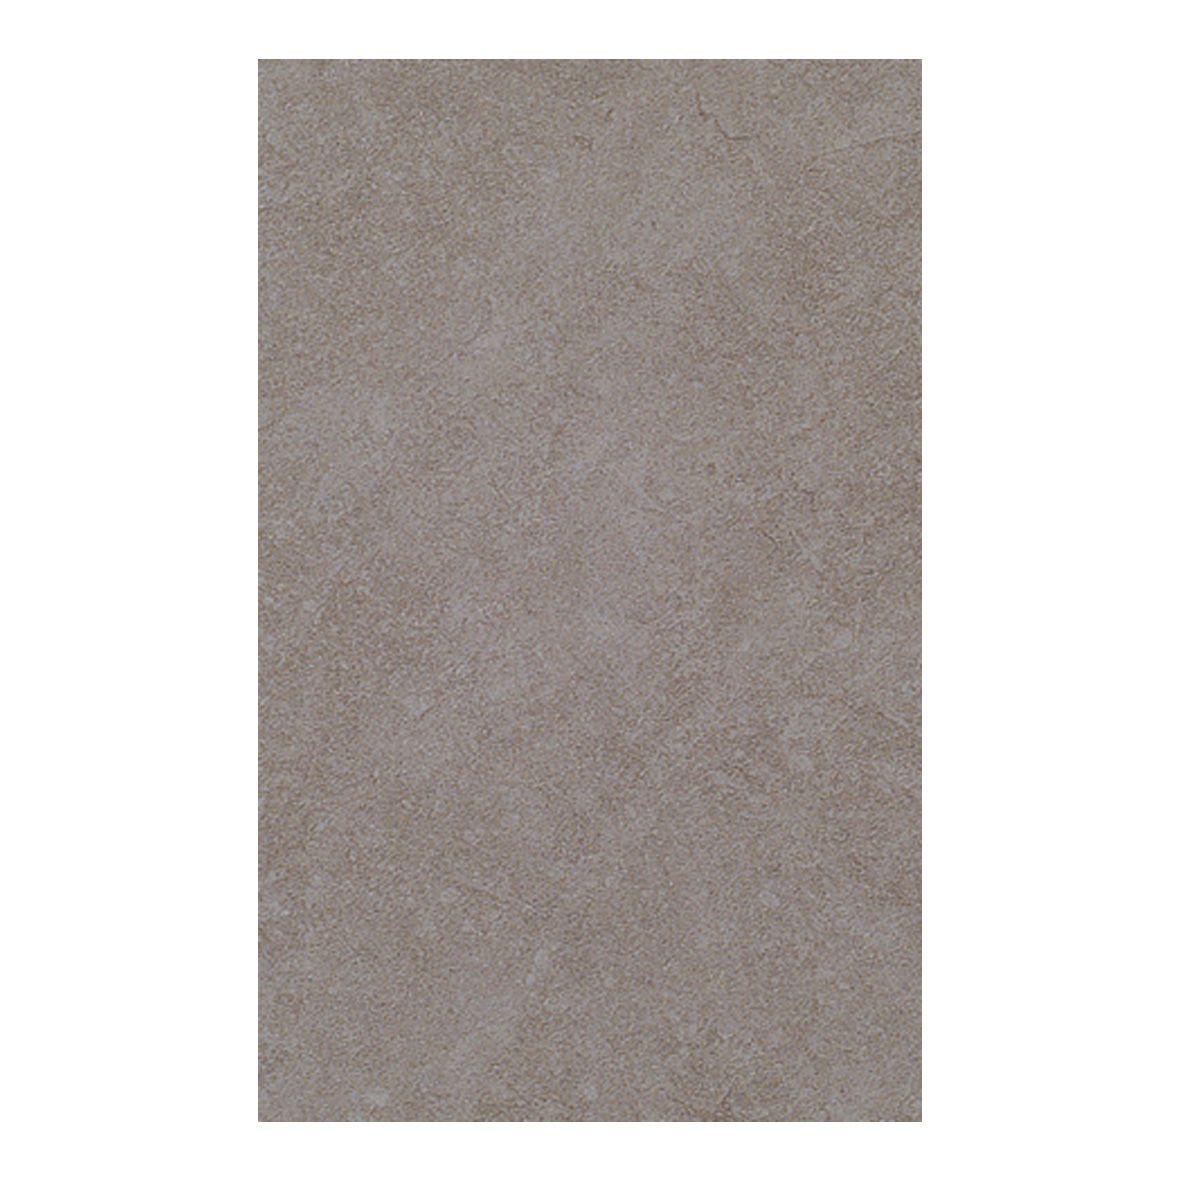 Vitra marfil light grey bathroom kitchen wall tiles gemini vitra tiles marfil range light grey grey light grey glazed ceramic suitable for wall and used in bathroom kitchen from ceramic tile distributors doublecrazyfo Choice Image